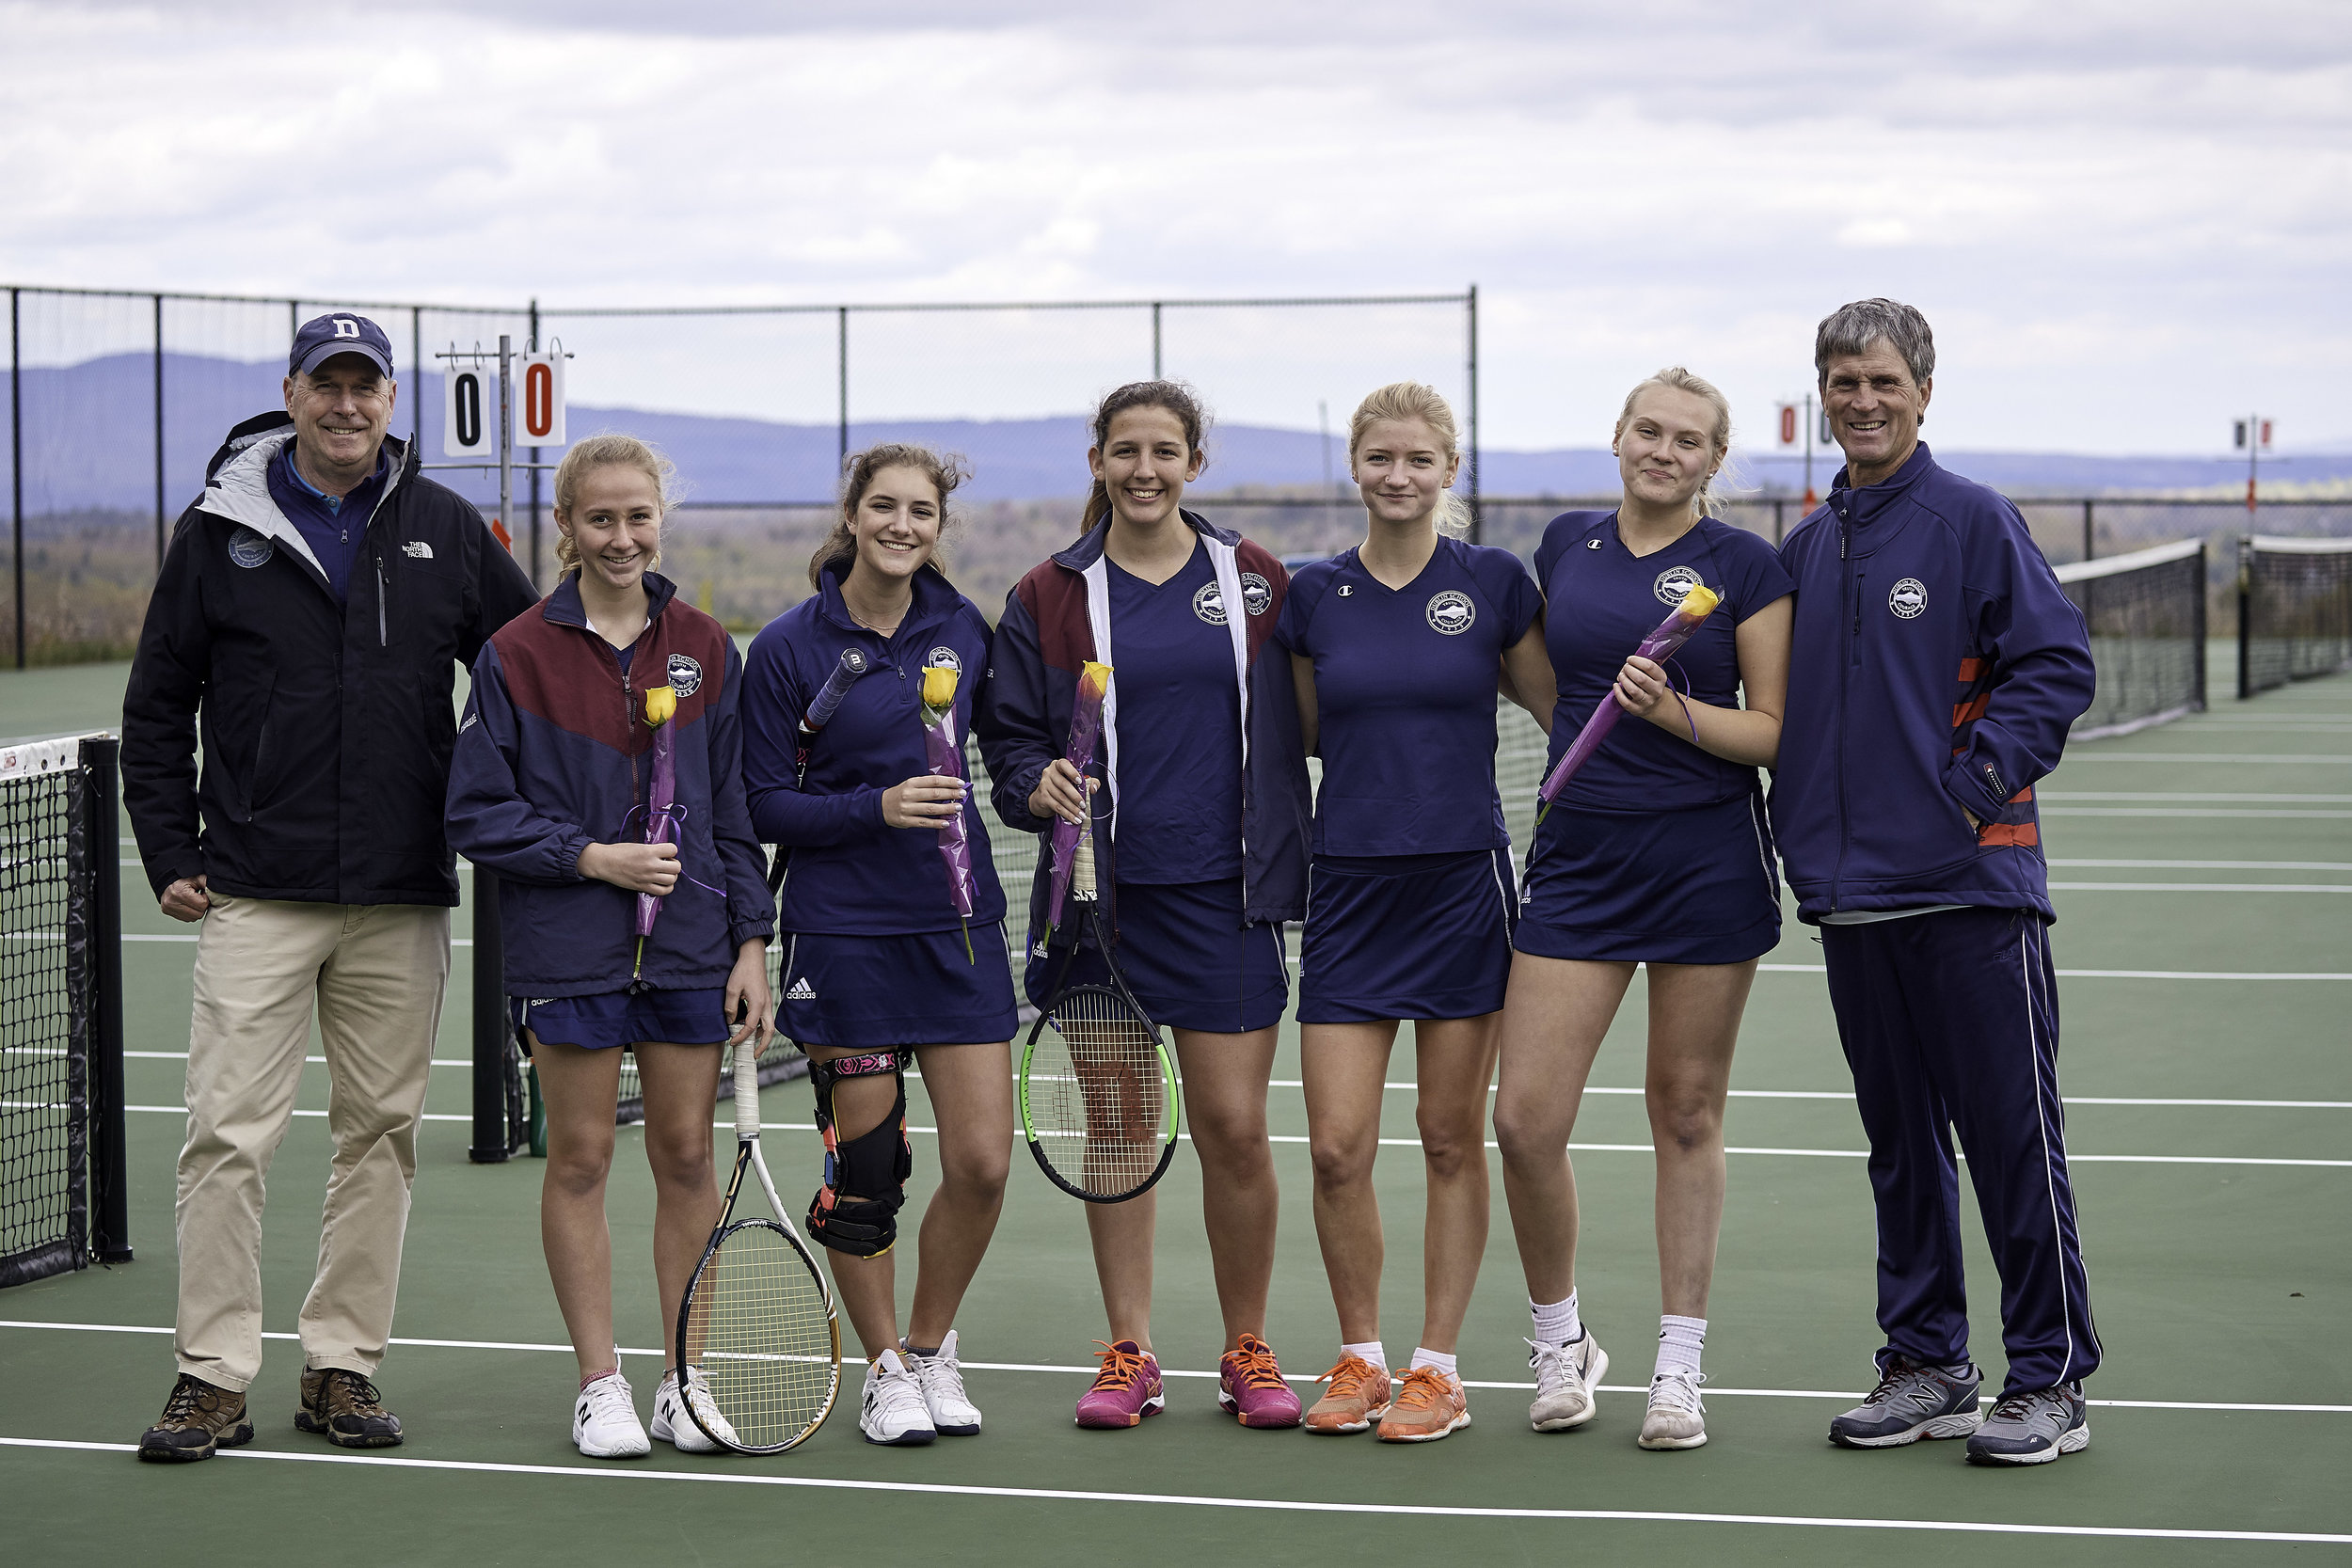 Girls Tennis vs. Winchendon School - May 15, 2019 -195153.jpg